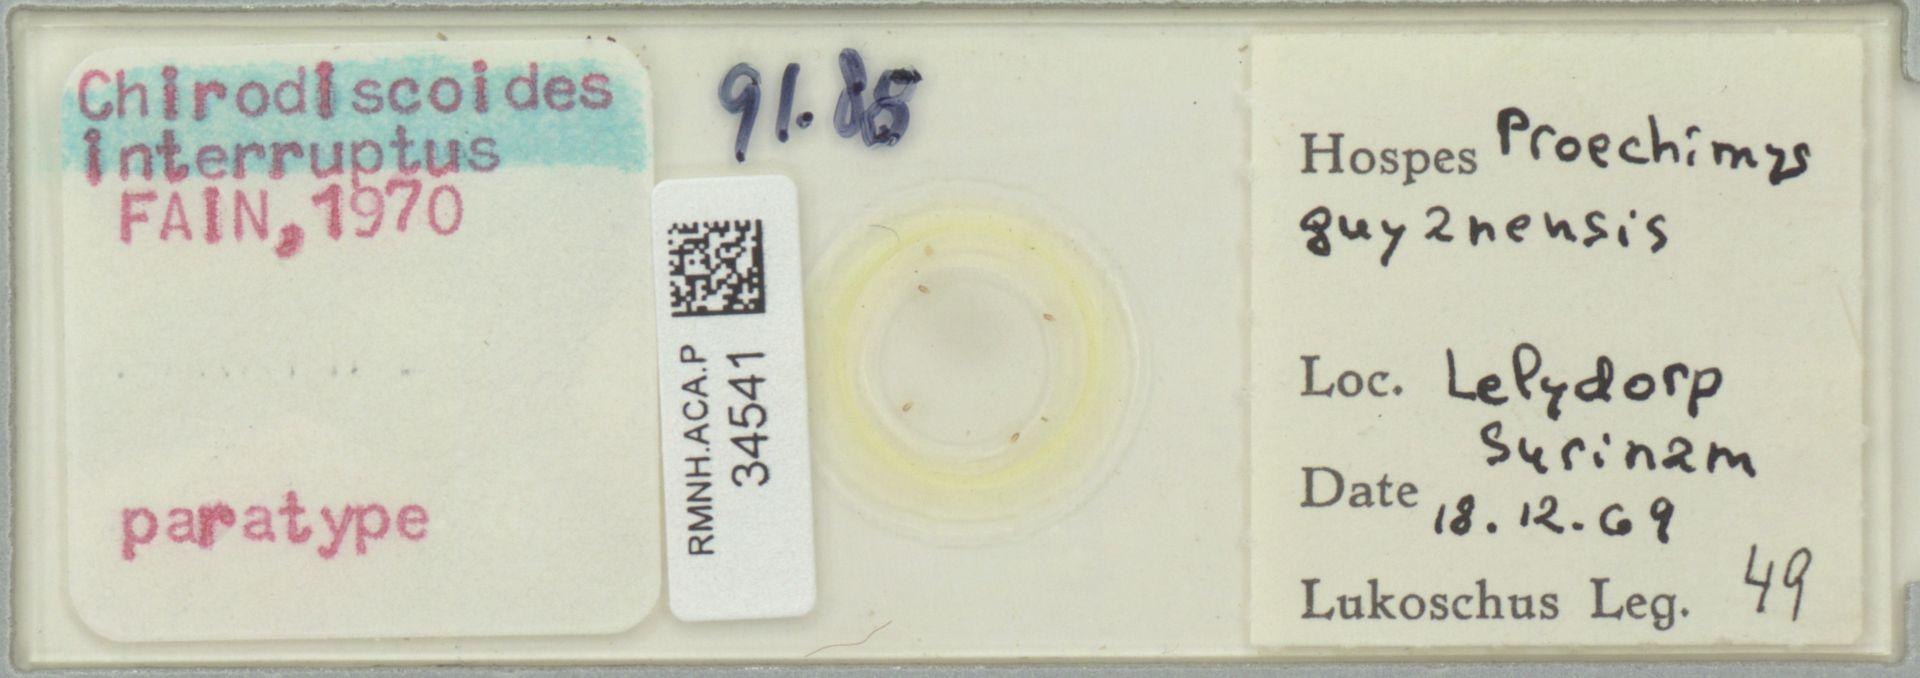 RMNH.ACA.P.34541   Chirodiscoides interruptus Fain, 1970